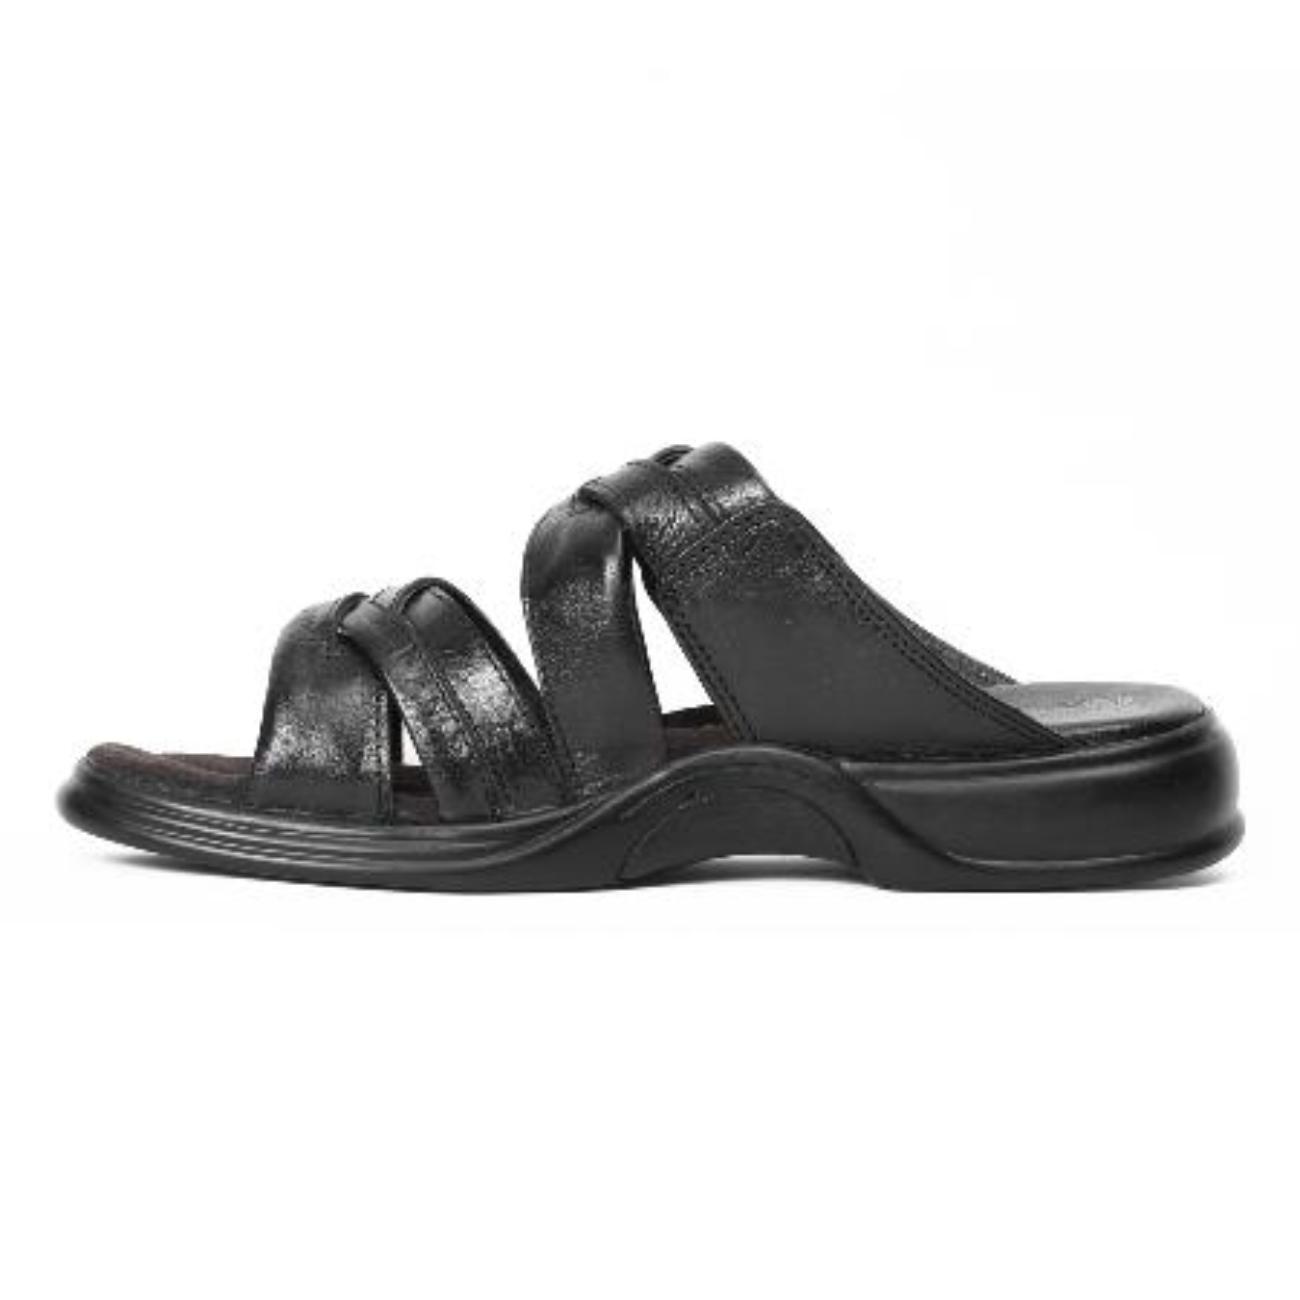 black slip-on slippers side view_2